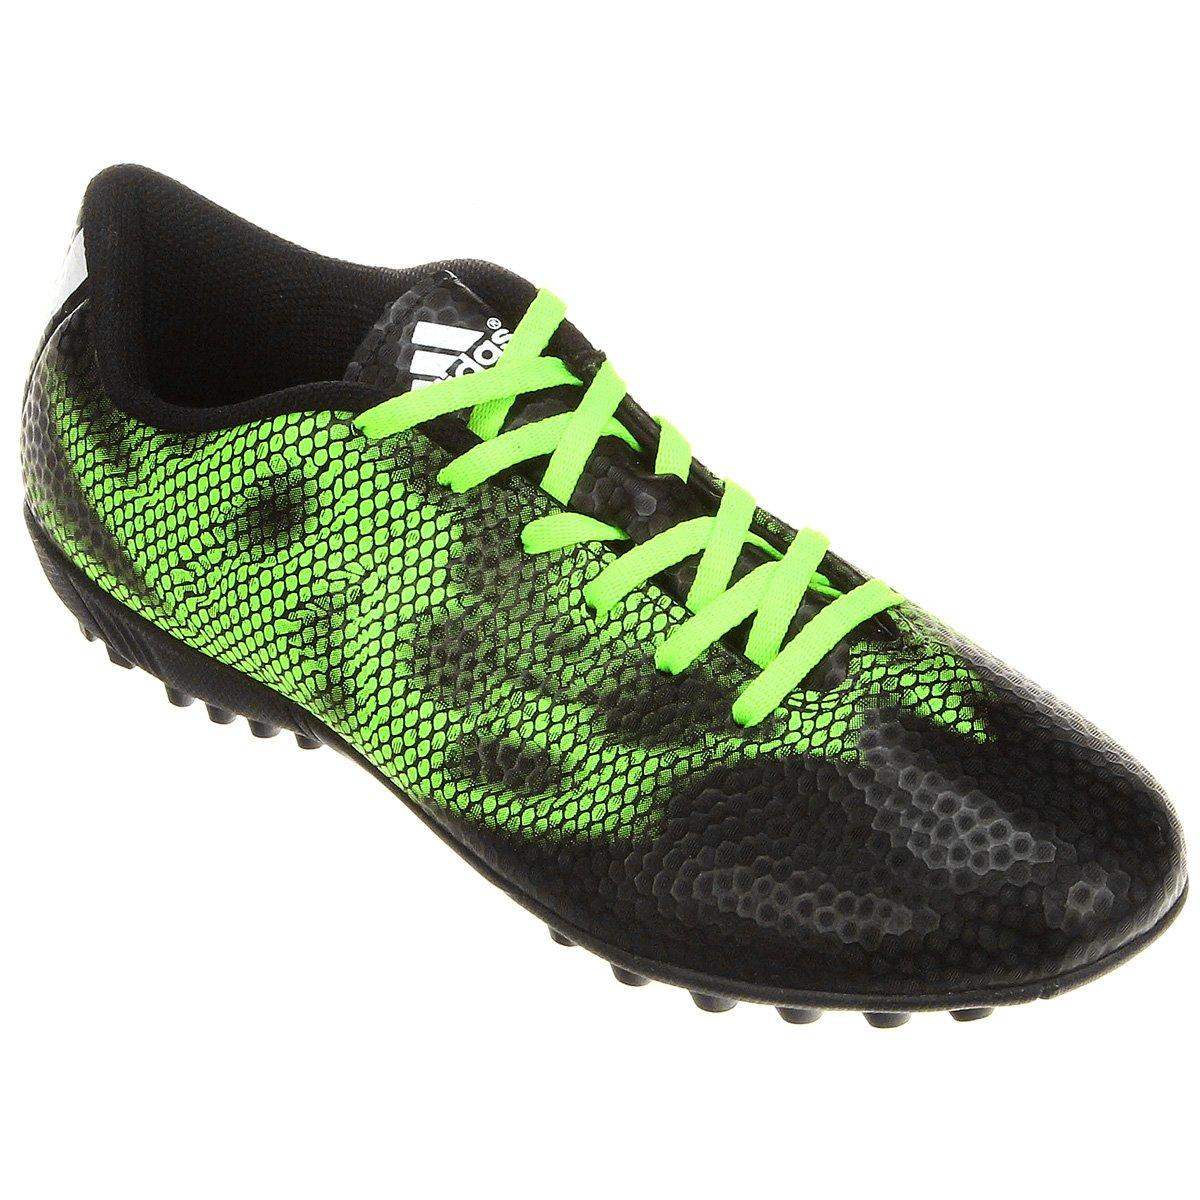 92a2c12761 Chuteira Society Adidas F5 TF Masculina - Compre Agora